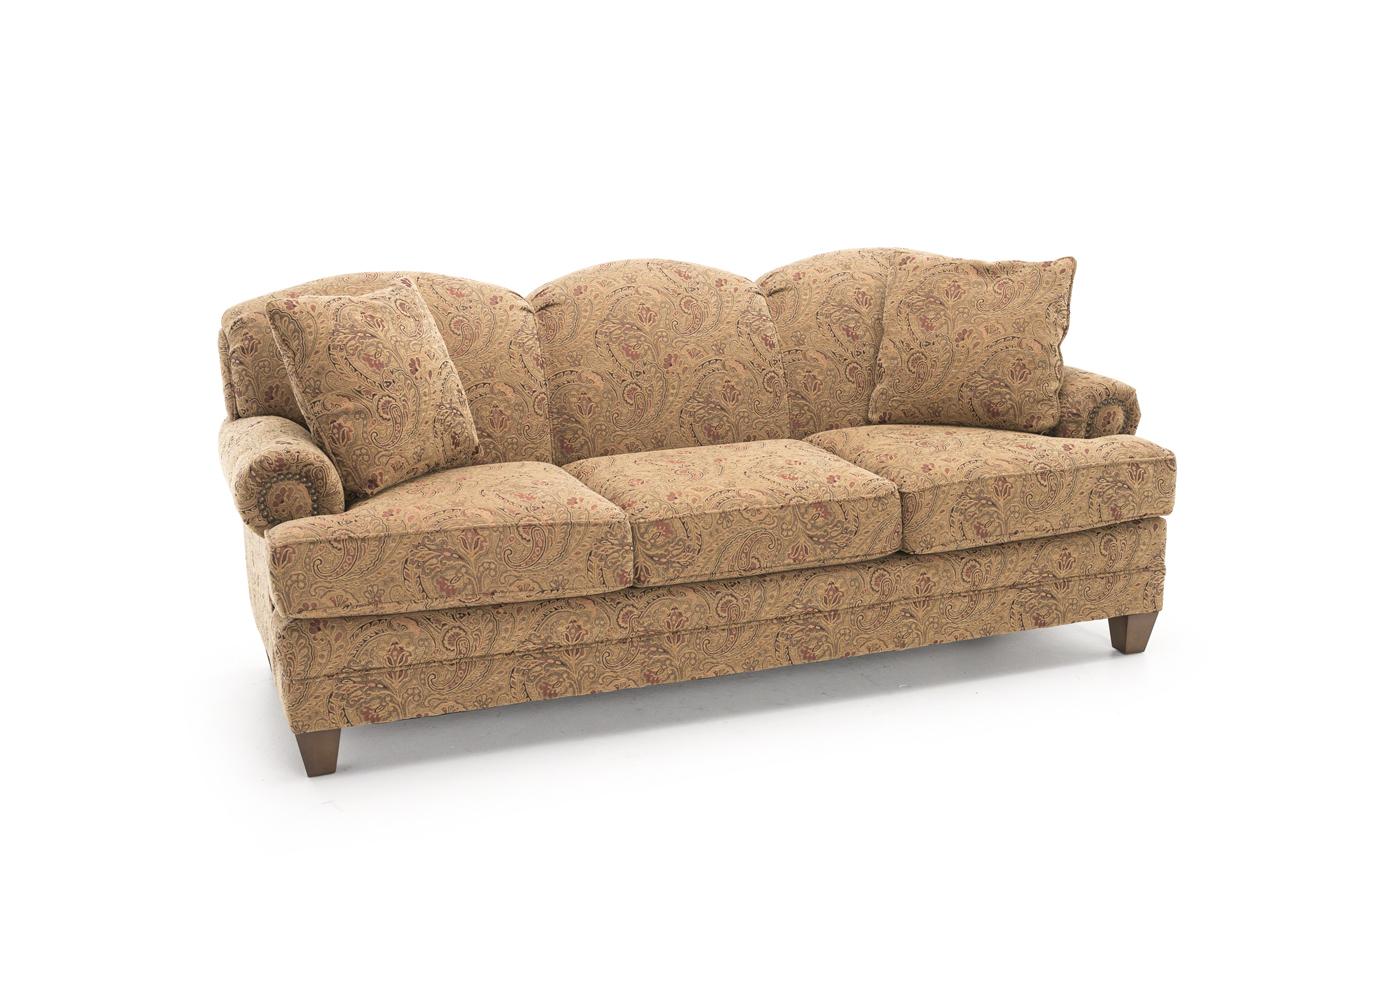 Anniston Sofa | Steinhafels Inside Callie Sofa Chairs (View 19 of 20)